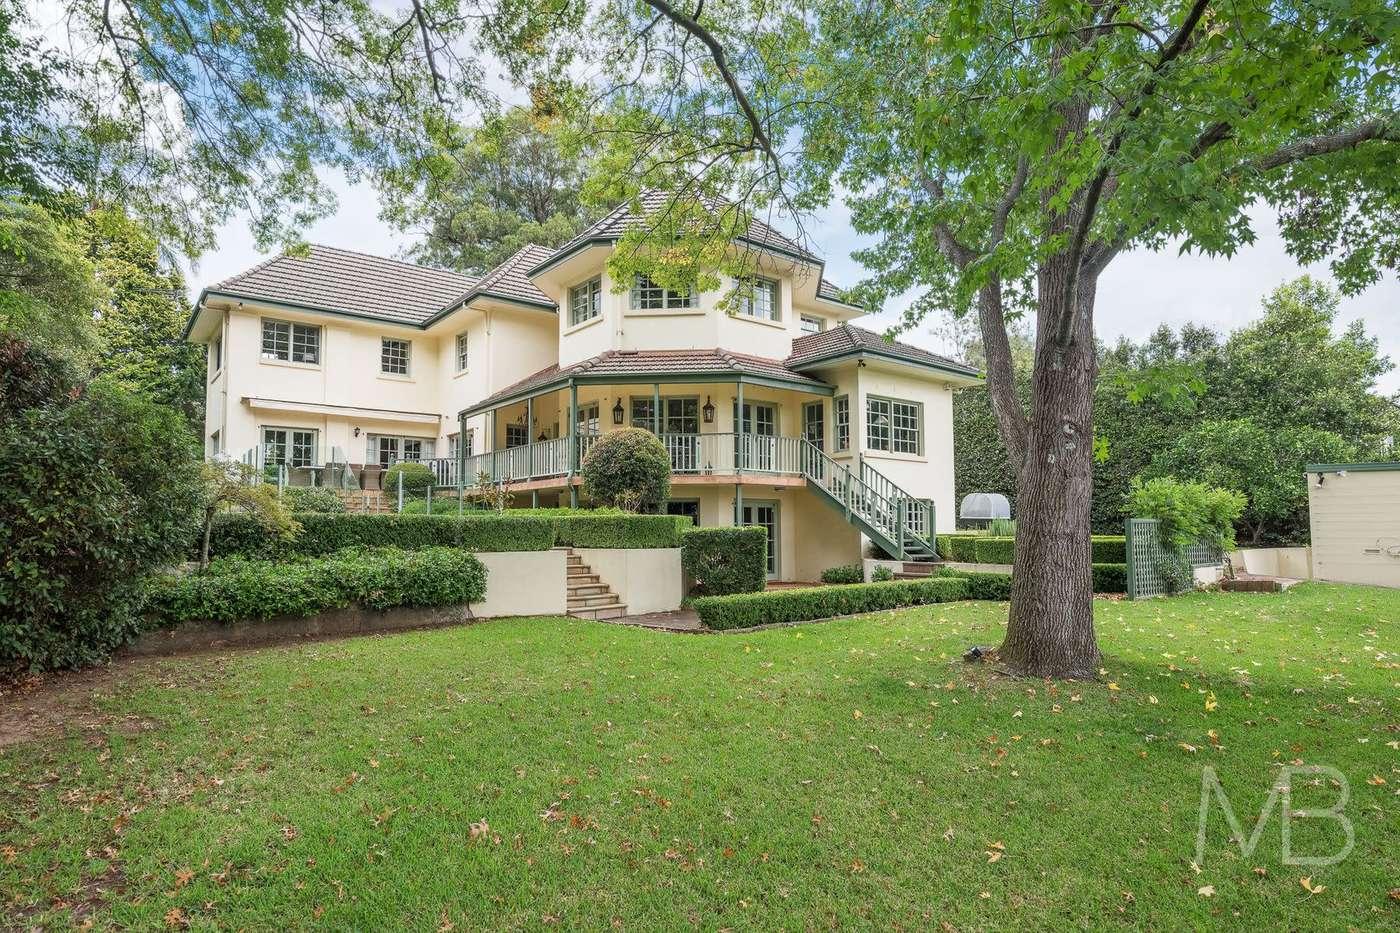 Main view of Homely house listing, 44 Greengate Road, Killara, NSW 2071